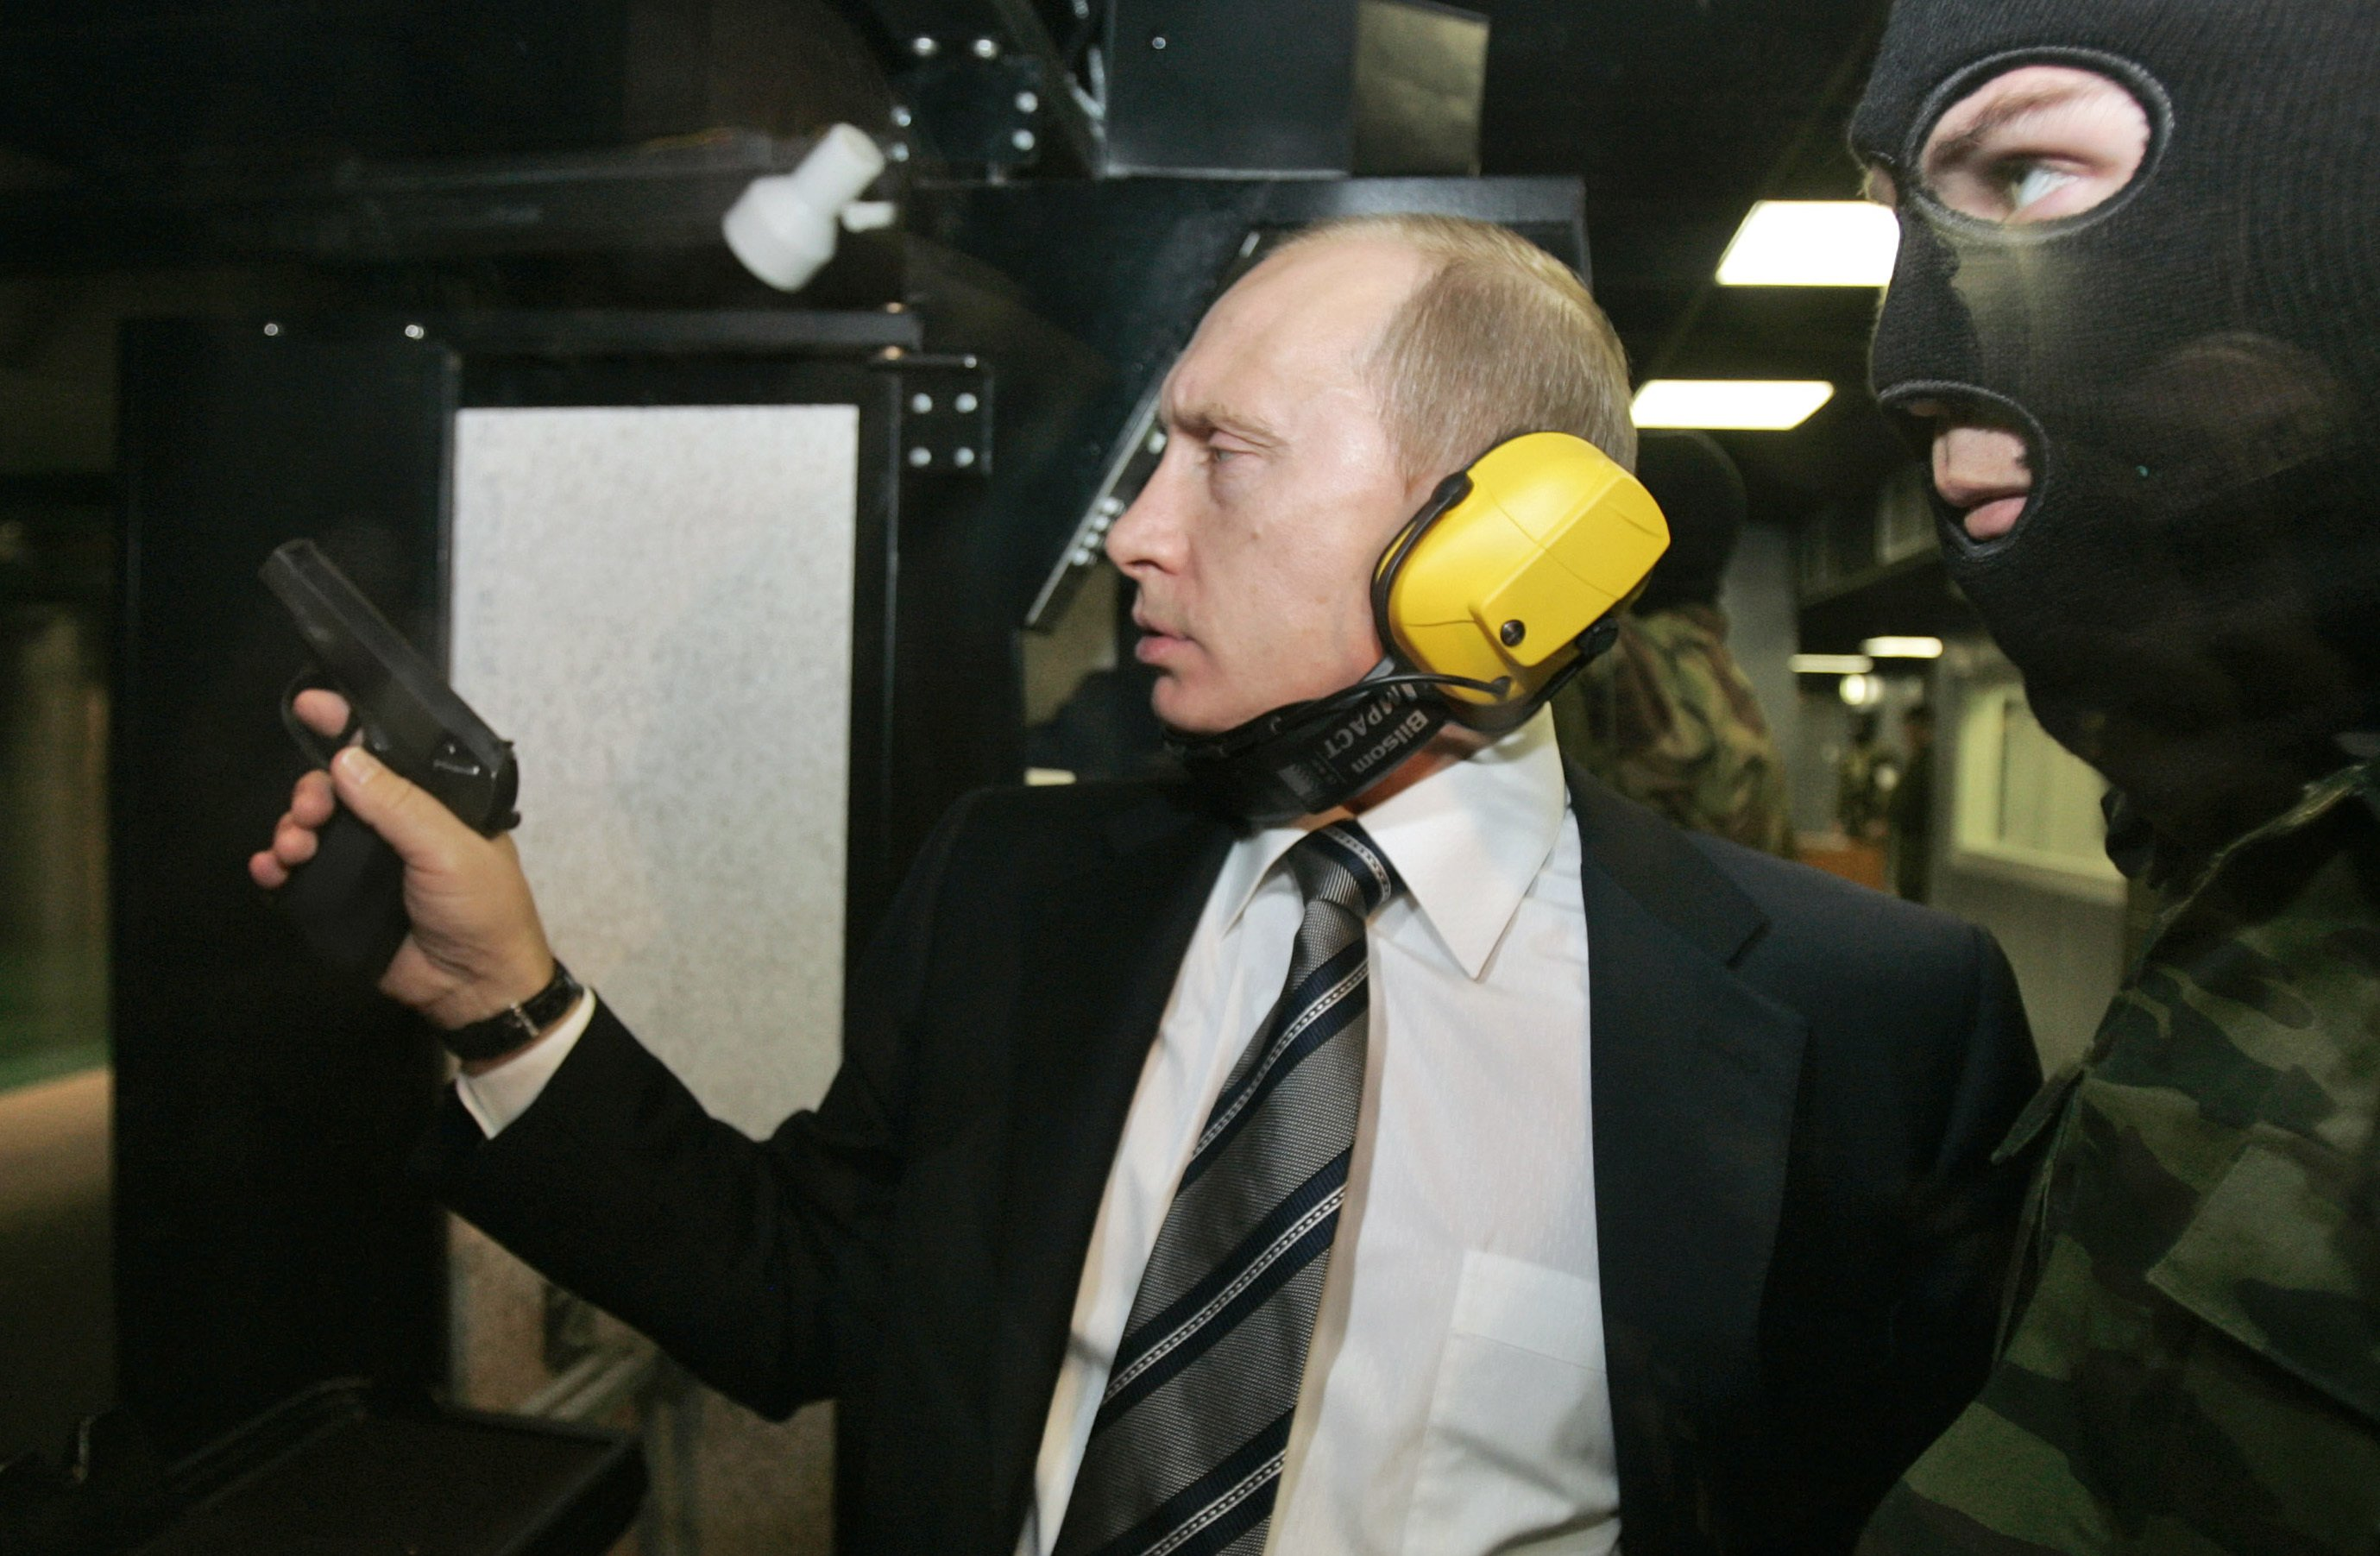 Russia hack of Democrat followed Trump speech